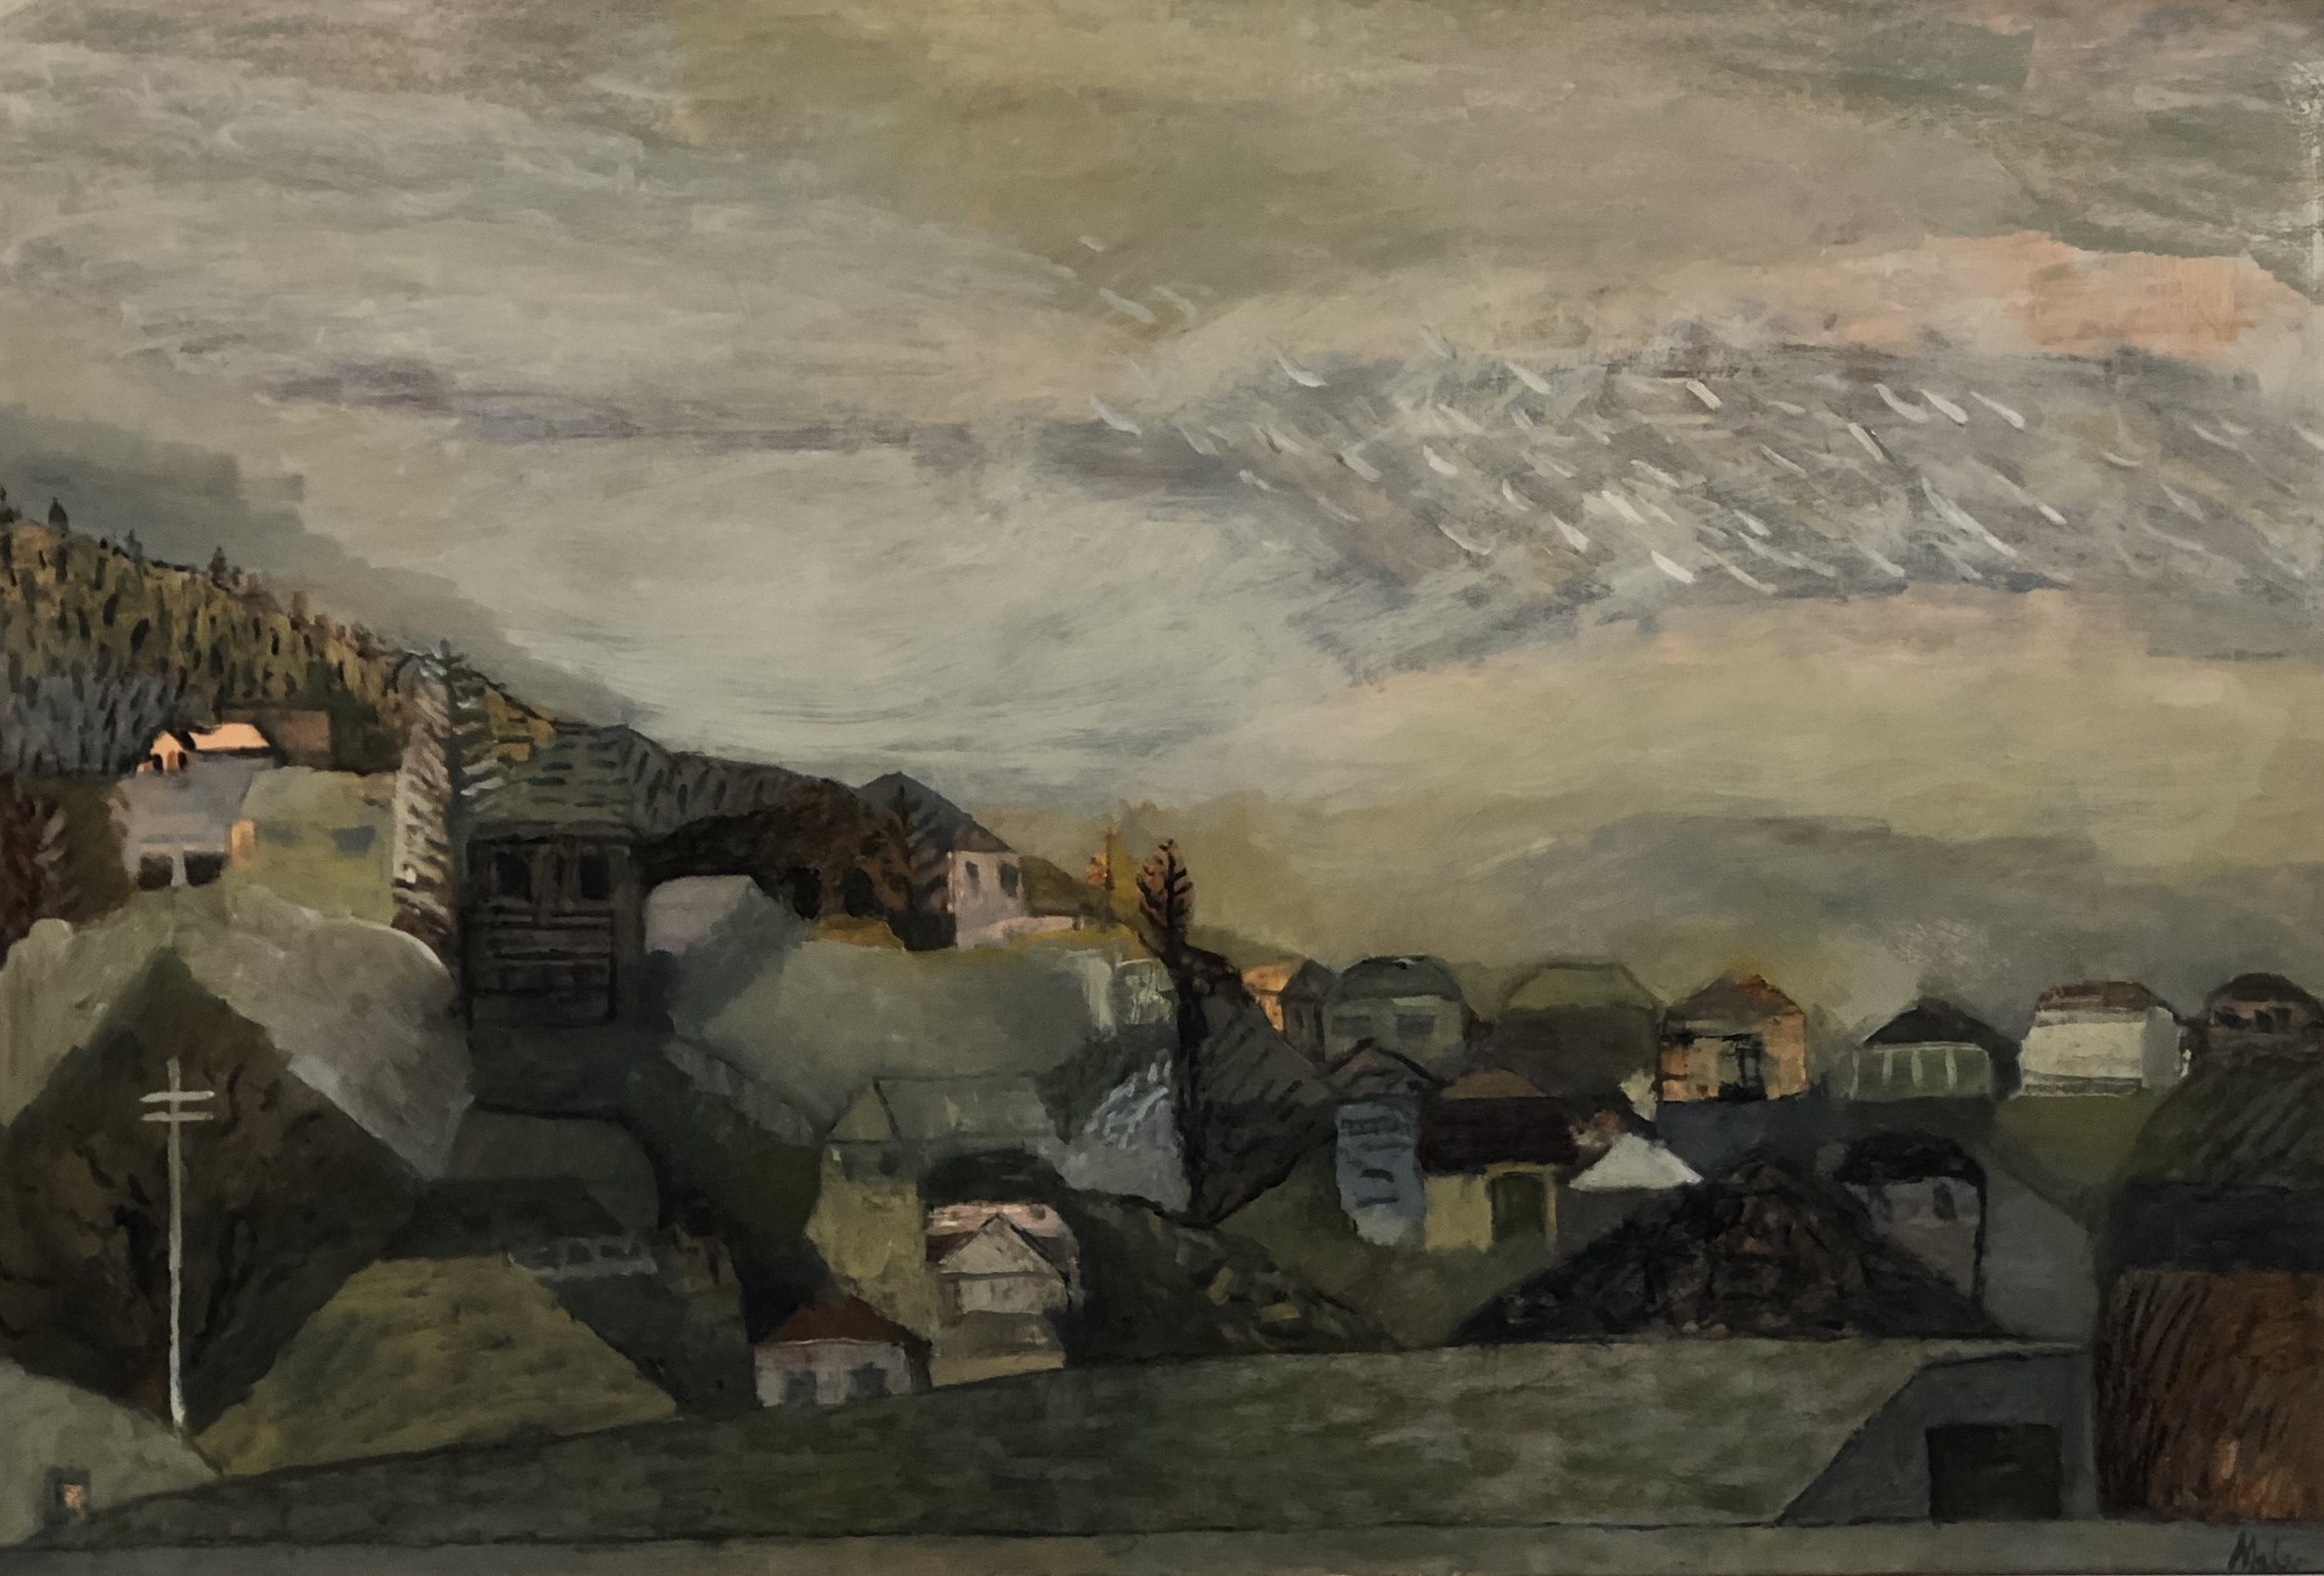 Paul Maher  Anzac Walk - downhill  2018 oil on canvas 85 x 125cm $1100.00